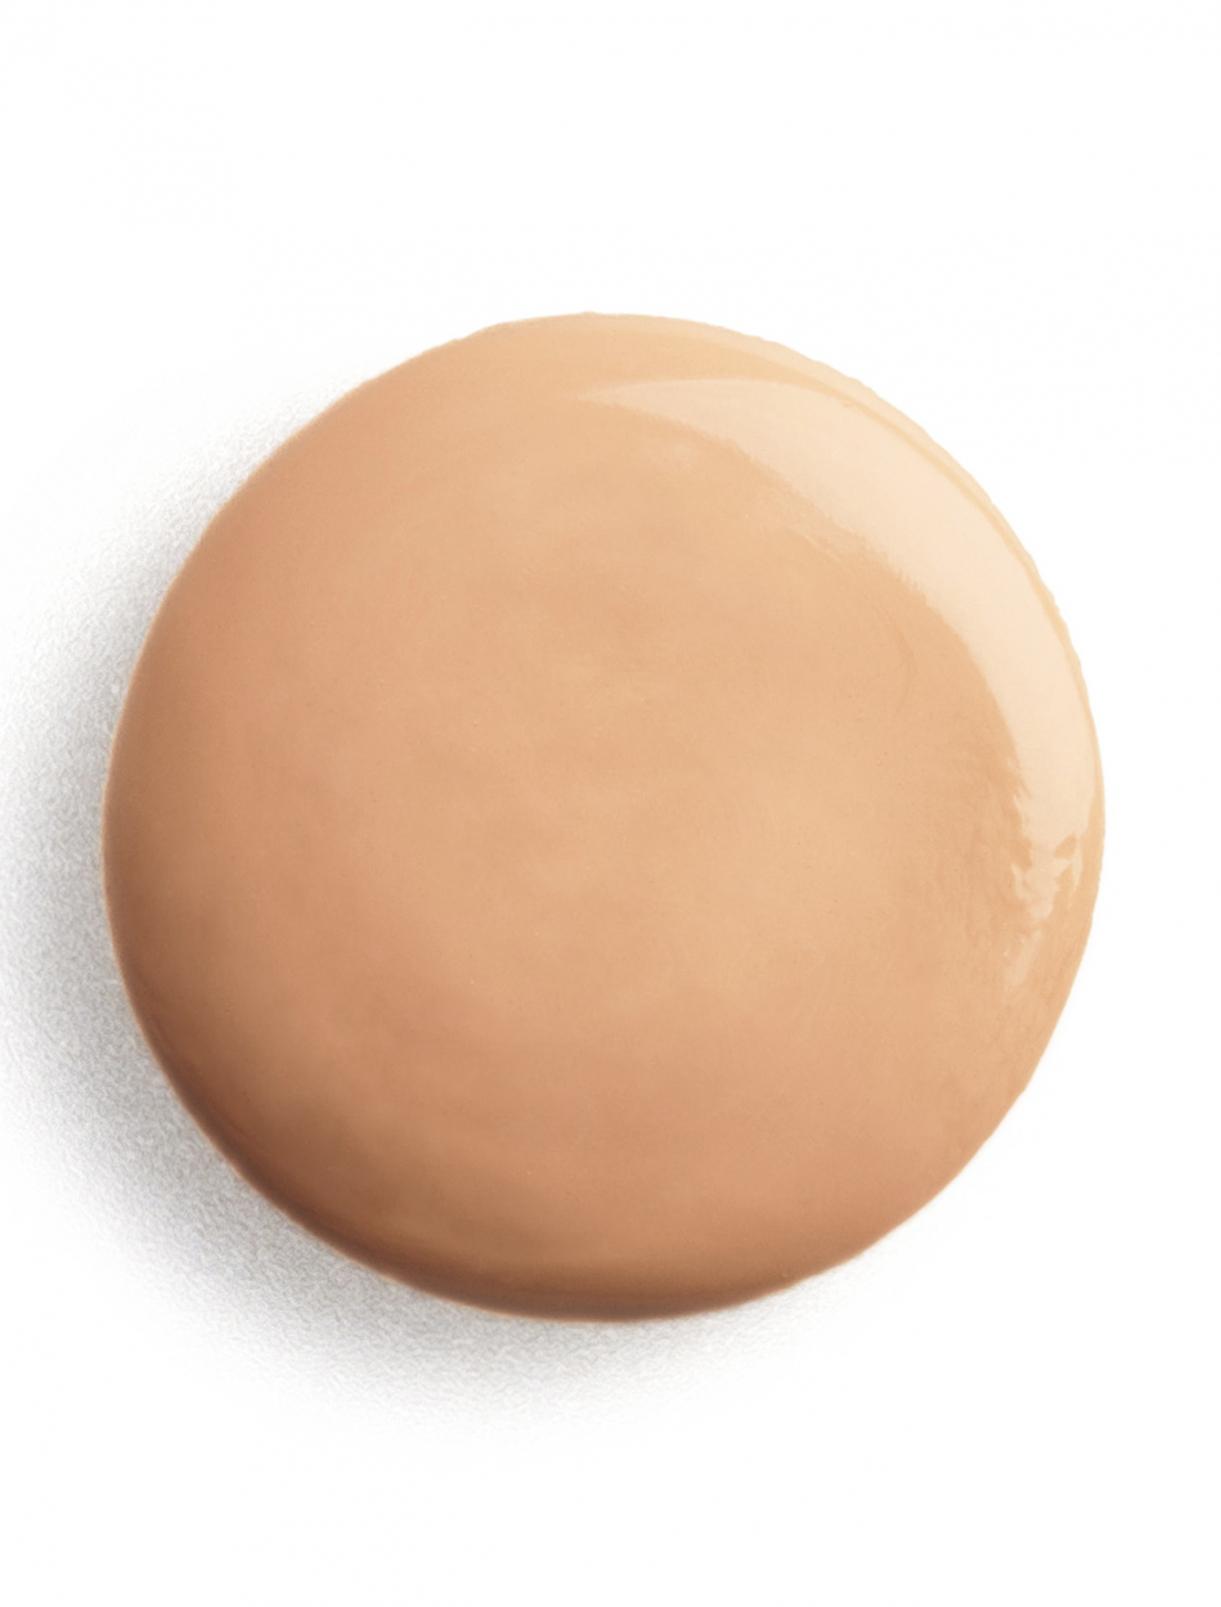 Тональный крем - 0B Бежевый фарфор, Sisleya, 30ml Sisley  –  Общий вид